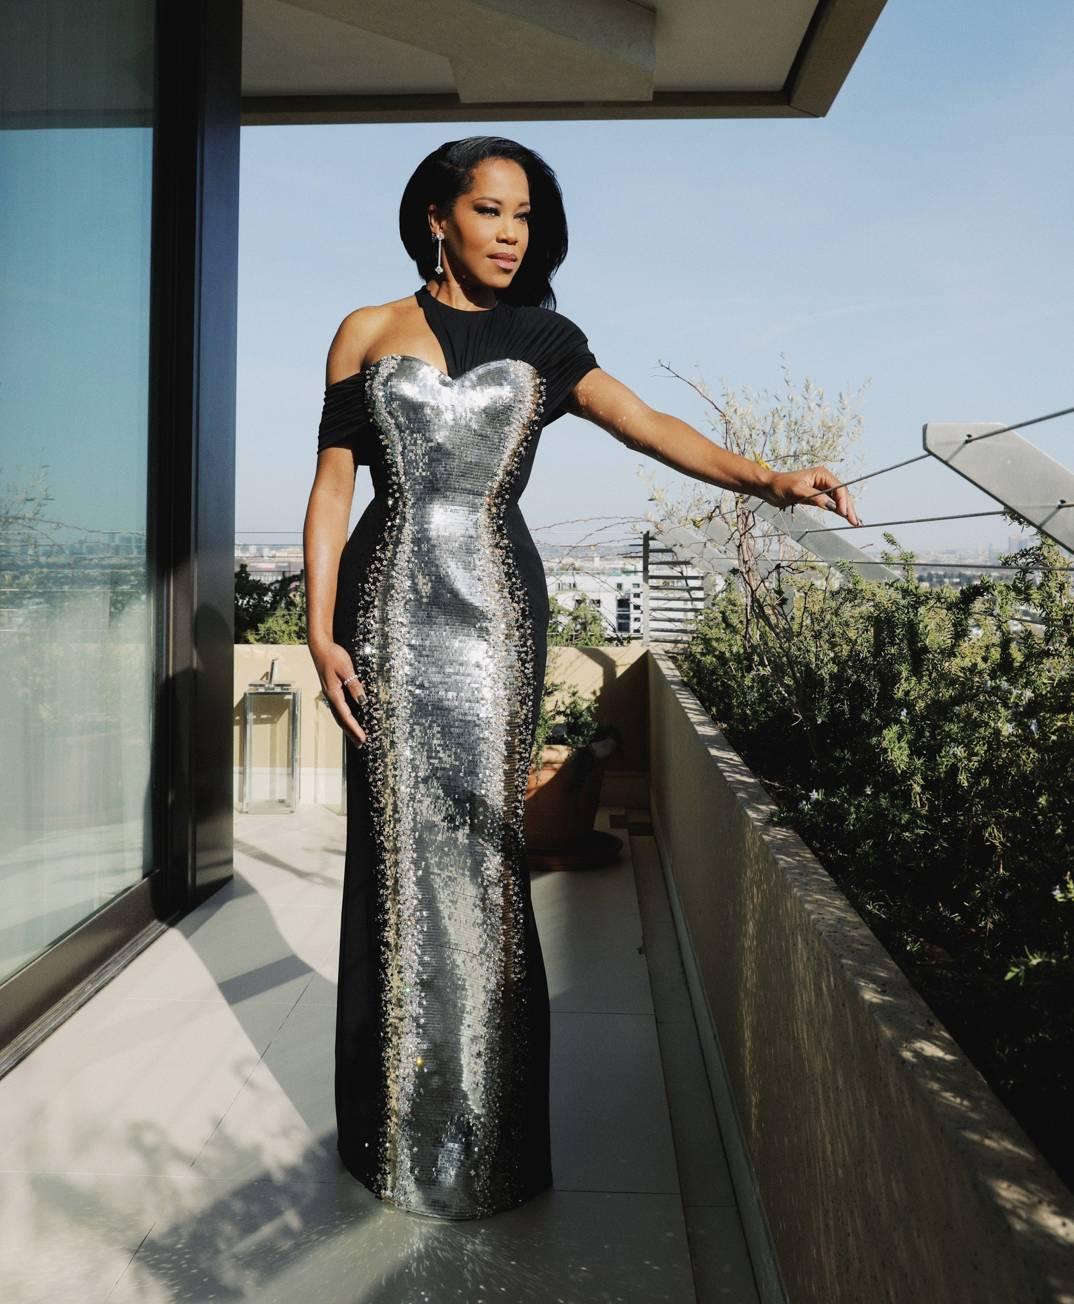 Regina King at the Golden Globes